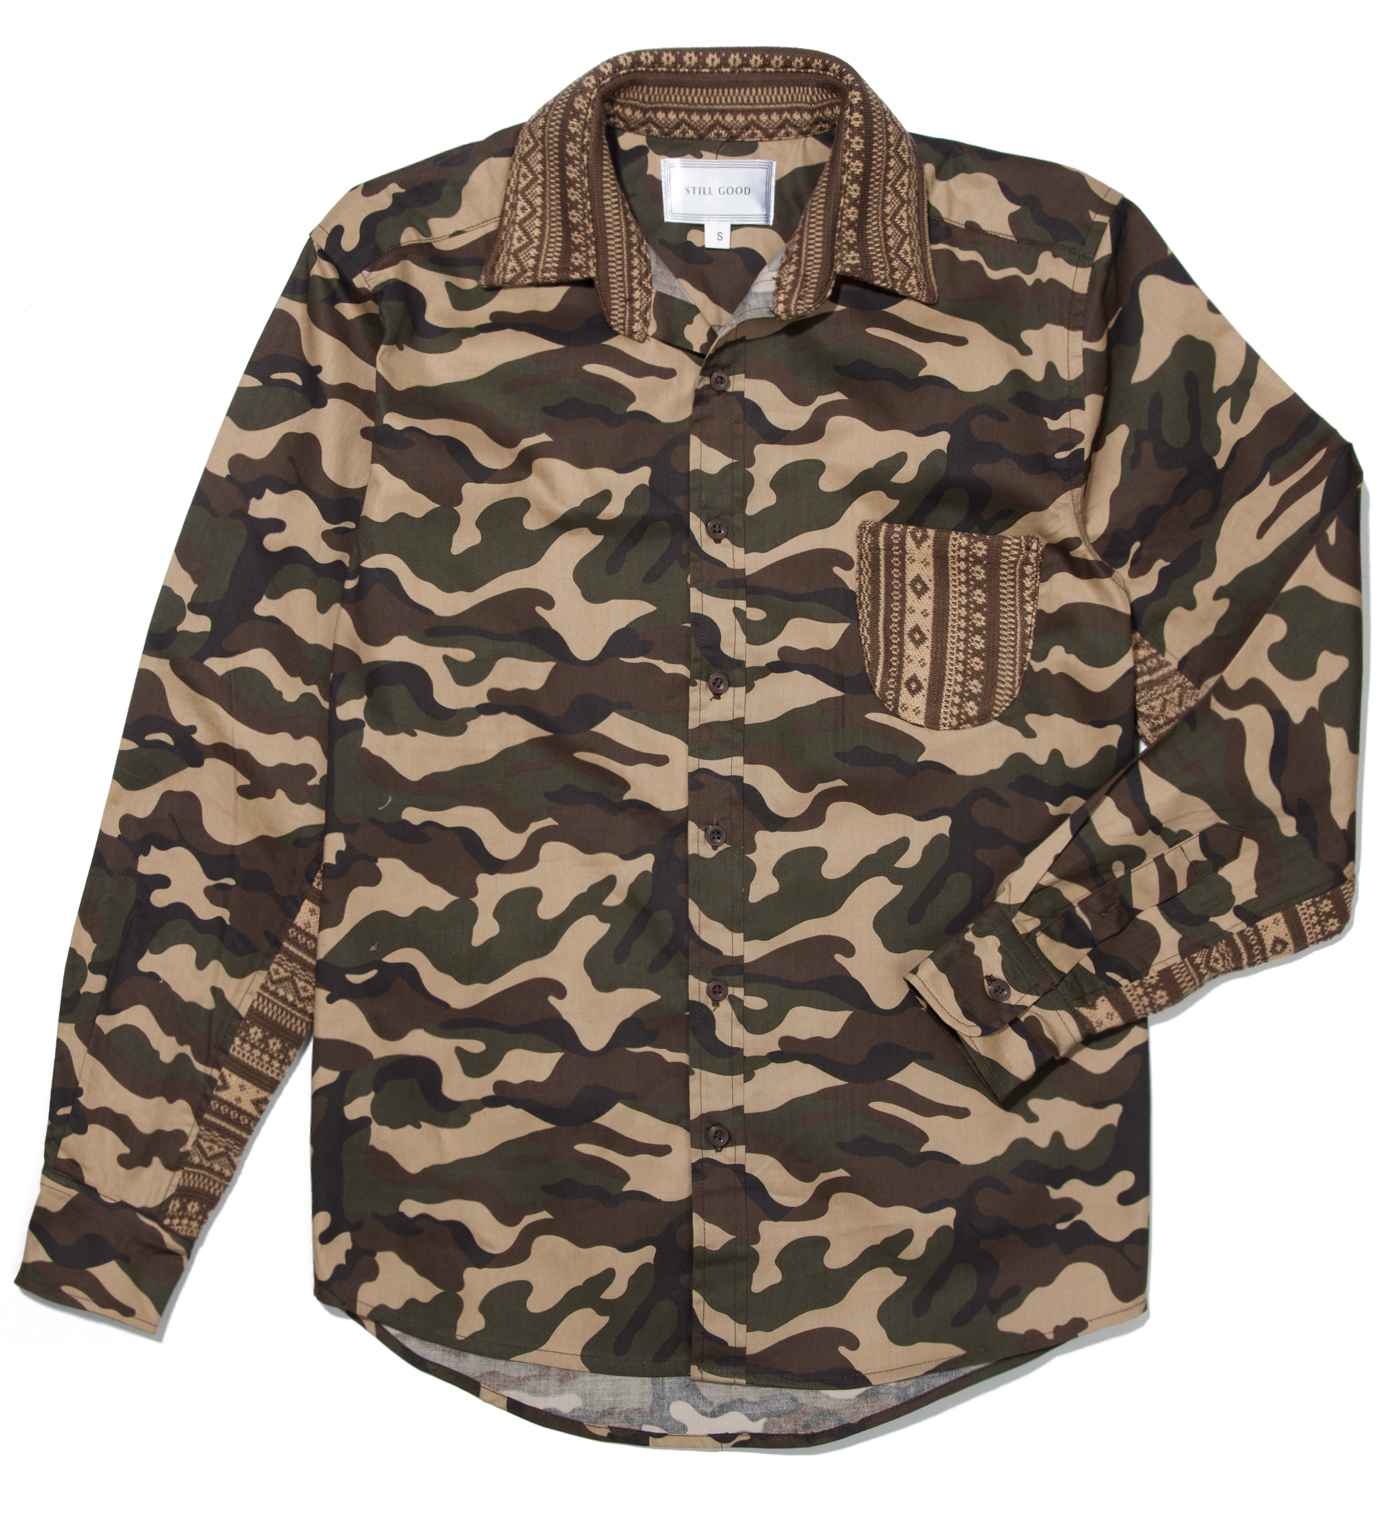 Still Good Camo Print Tomorrow Shirt